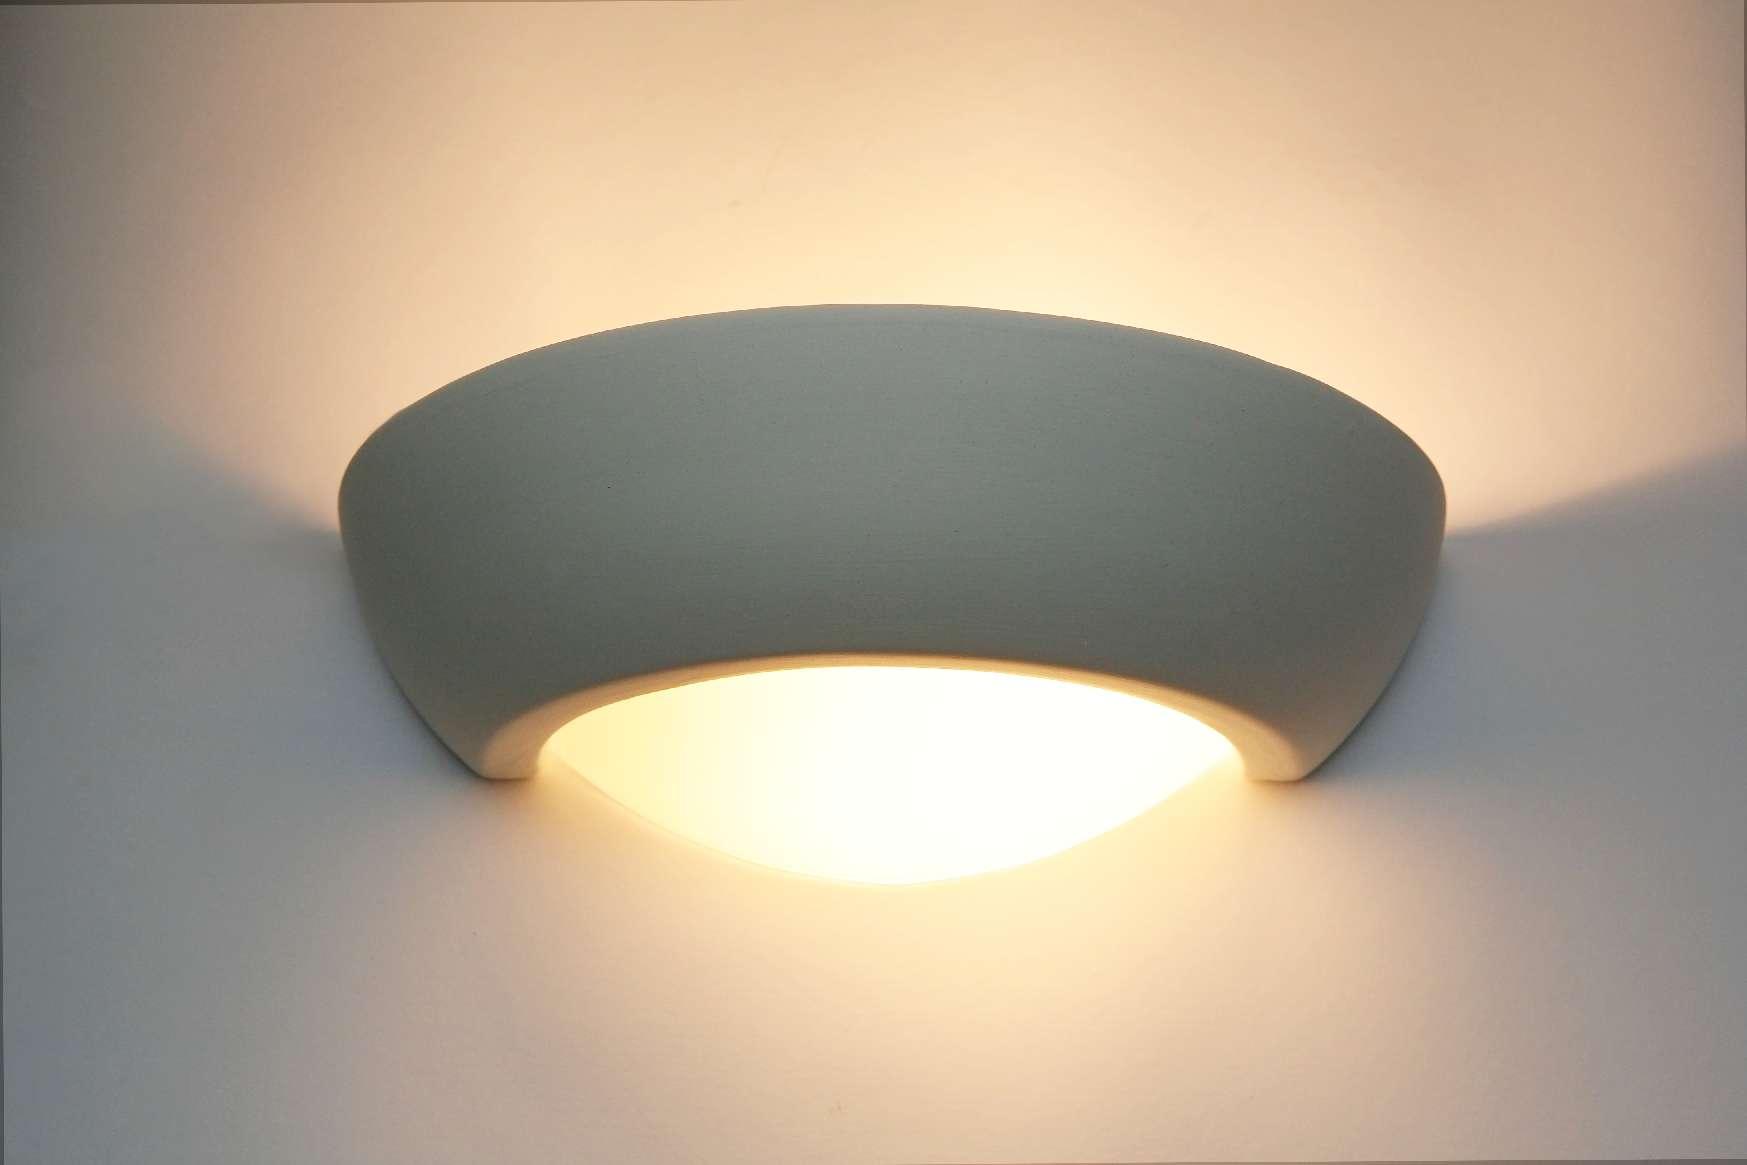 wandlampe keramik wandleuchte gips lampe leuchte steffen. Black Bedroom Furniture Sets. Home Design Ideas